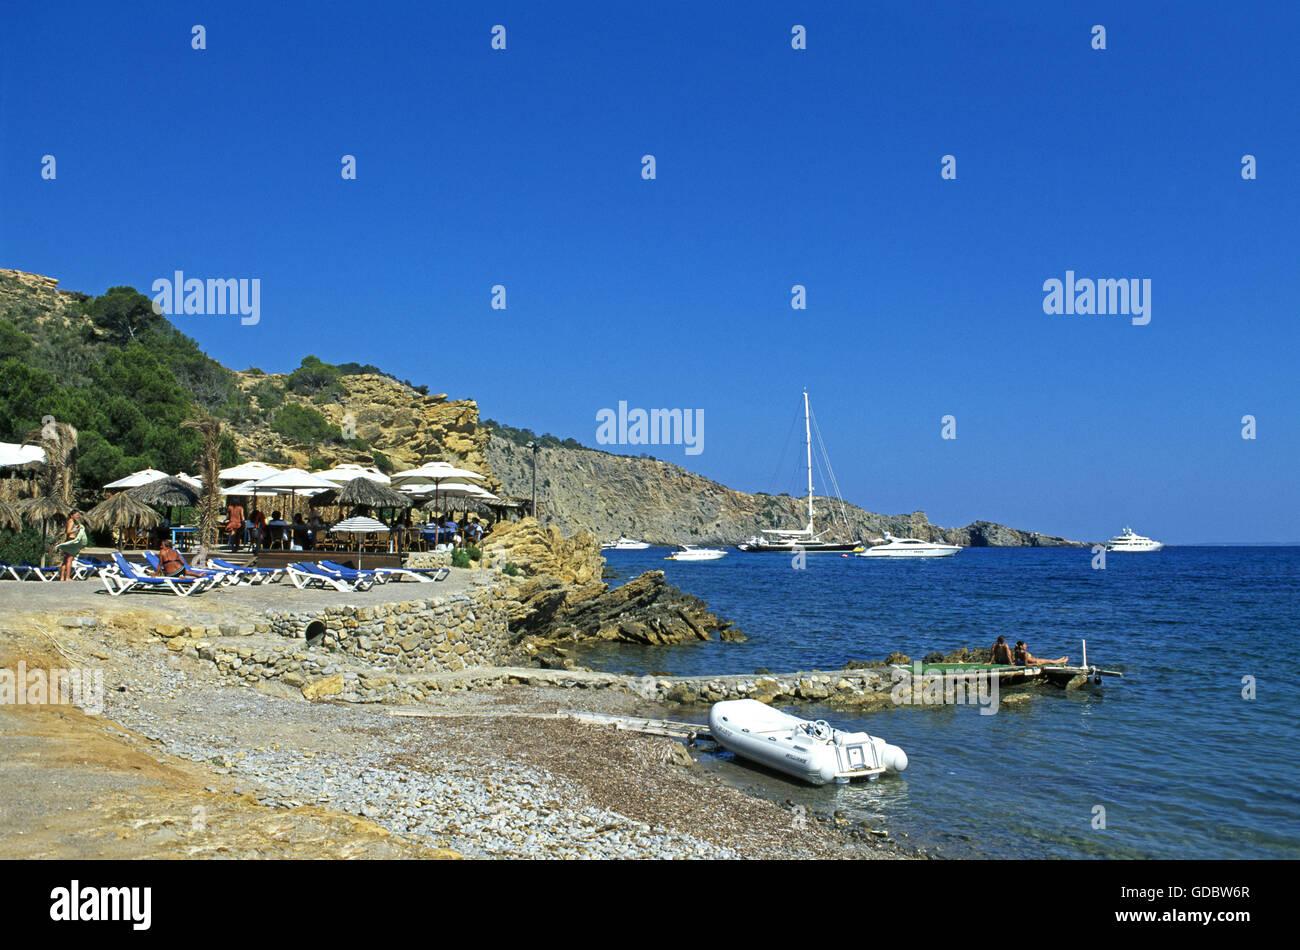 Beach nearby Sa Caleta, Ibiza, Balearic Islands, Spain - Stock Image